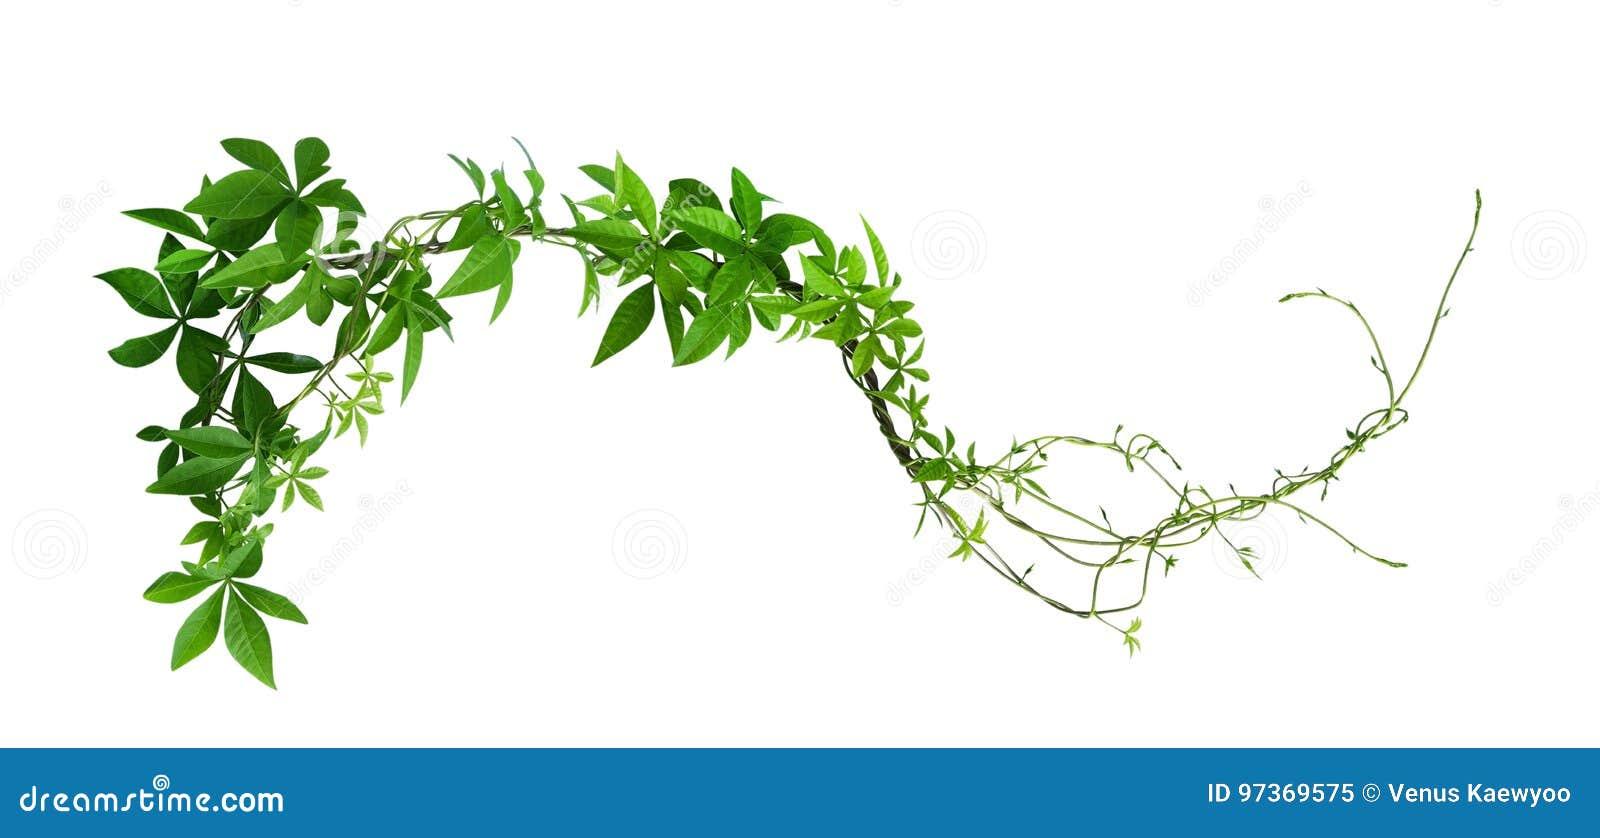 Jungle Vines Stock Photos - Download 2,621 Royalty Free Photos